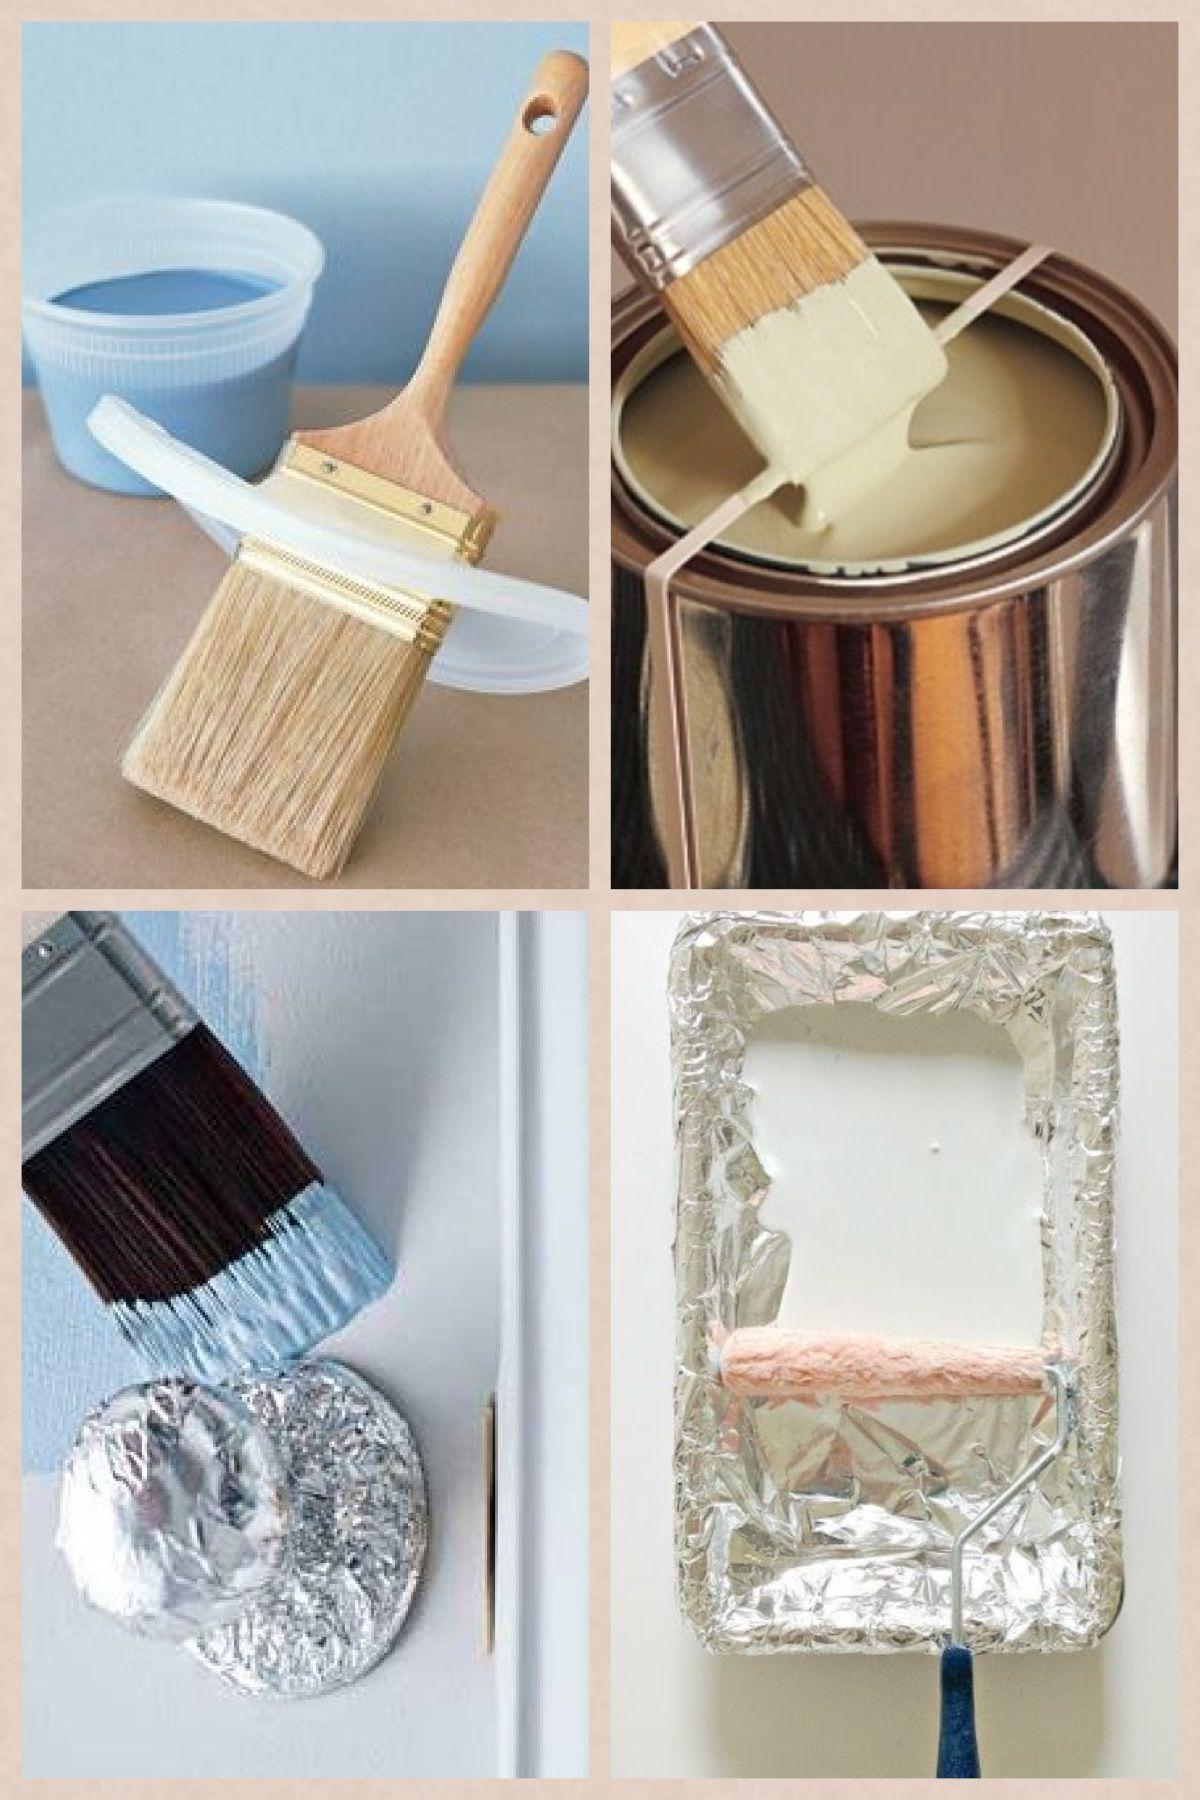 Thursdays Tip Of The Week Painting Tips Okay That Doorknob - Painting hacks